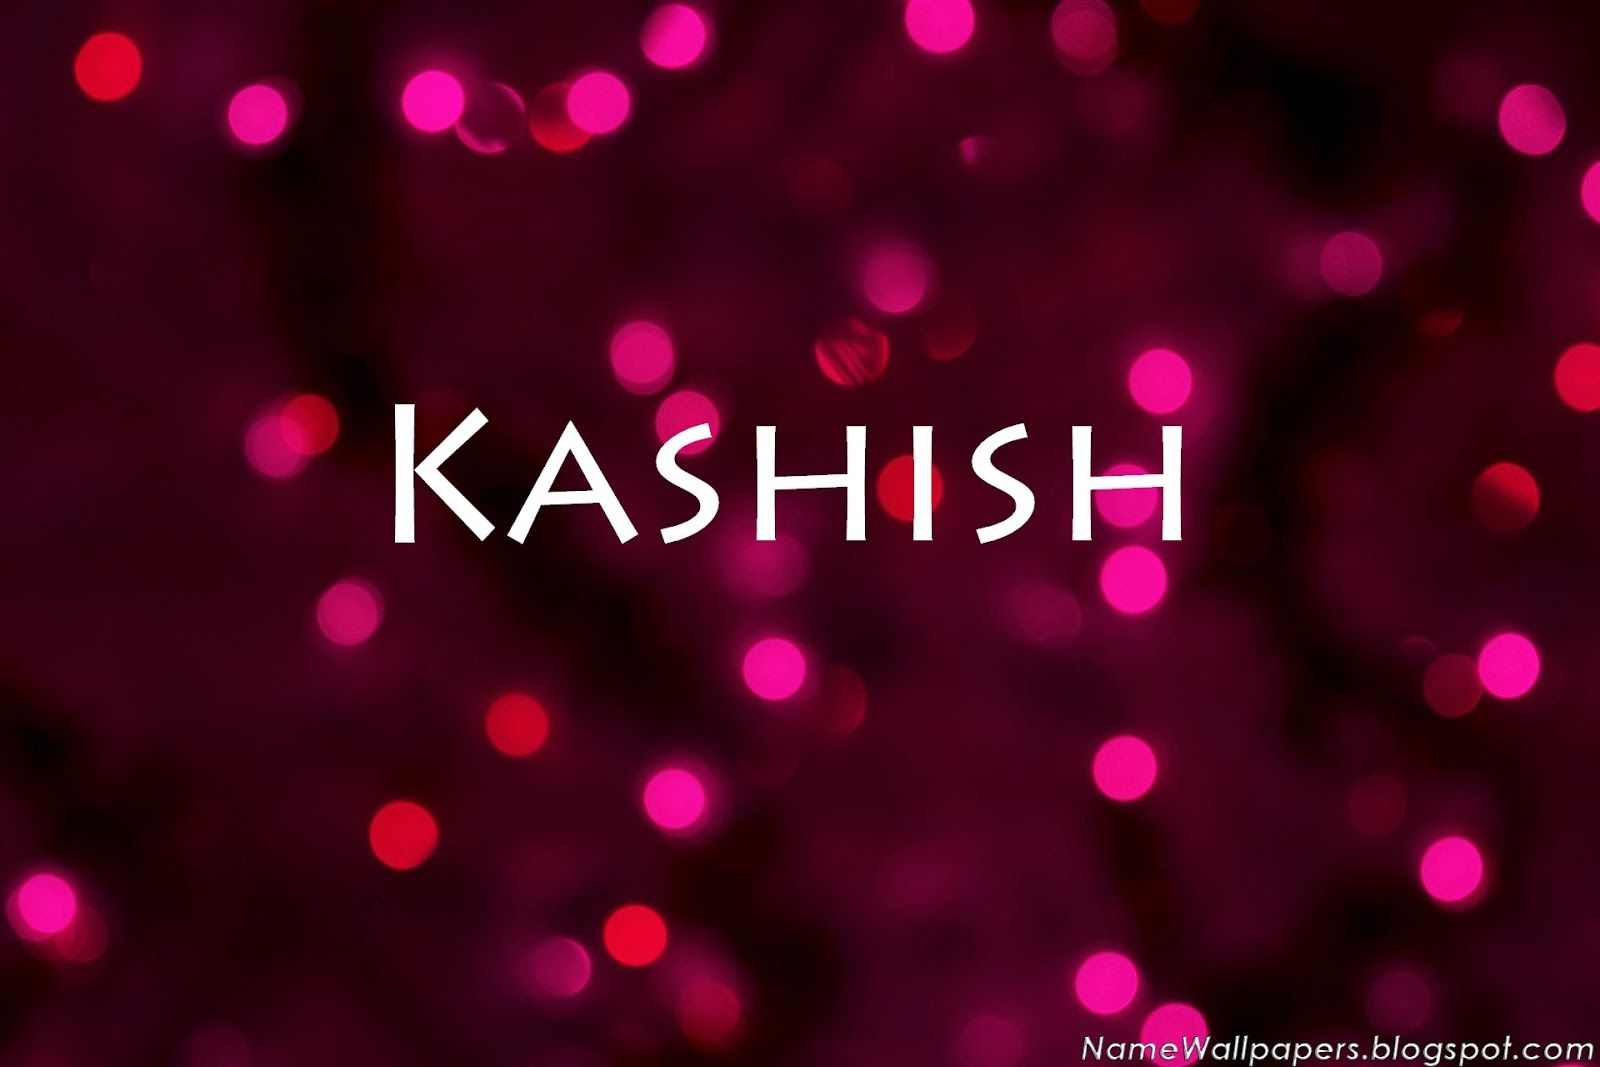 Popular Wallpaper Name Yash - bf627c194dc4e8d130a45600ee13de4b  You Should Have_28180.jpg